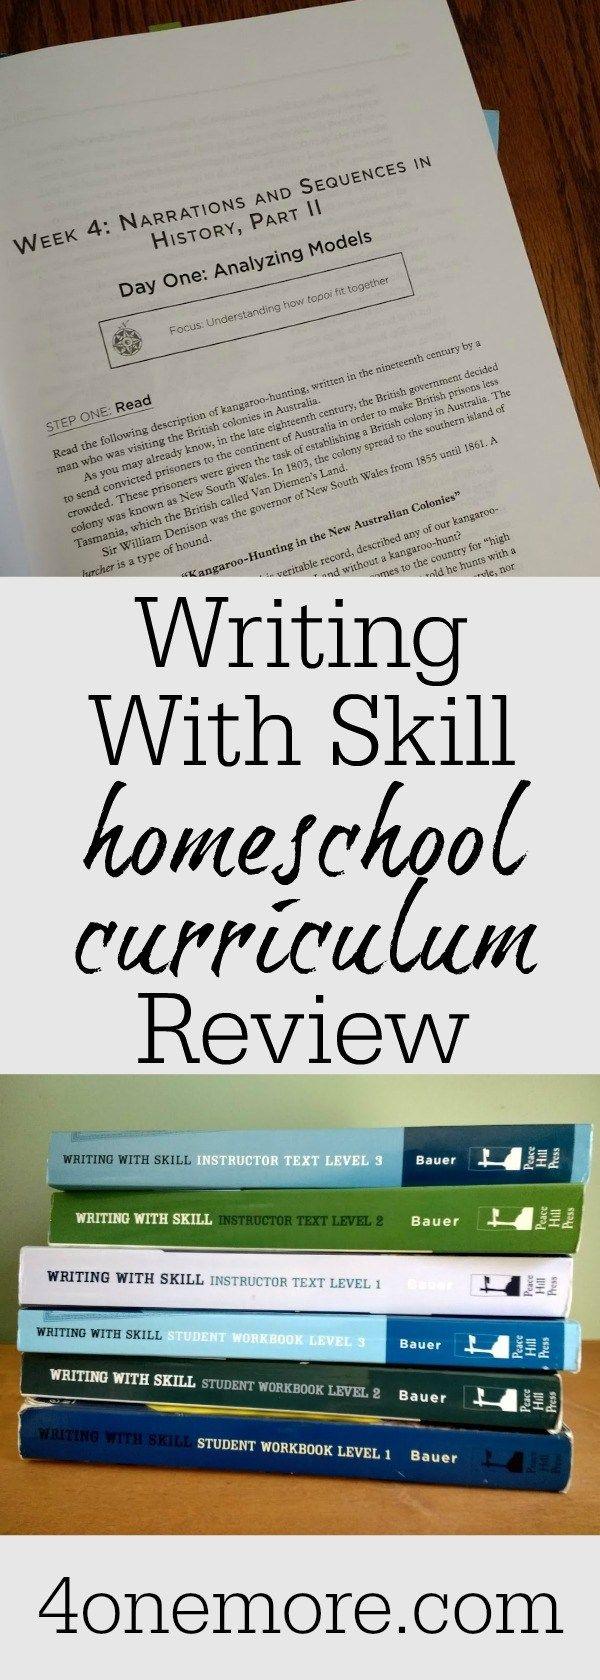 Writing With Skill Homeschool Curriculum Review Homeschool Curriculum Reviews Homeschool Writing Curriculum Writing Curriculum [ 1680 x 600 Pixel ]